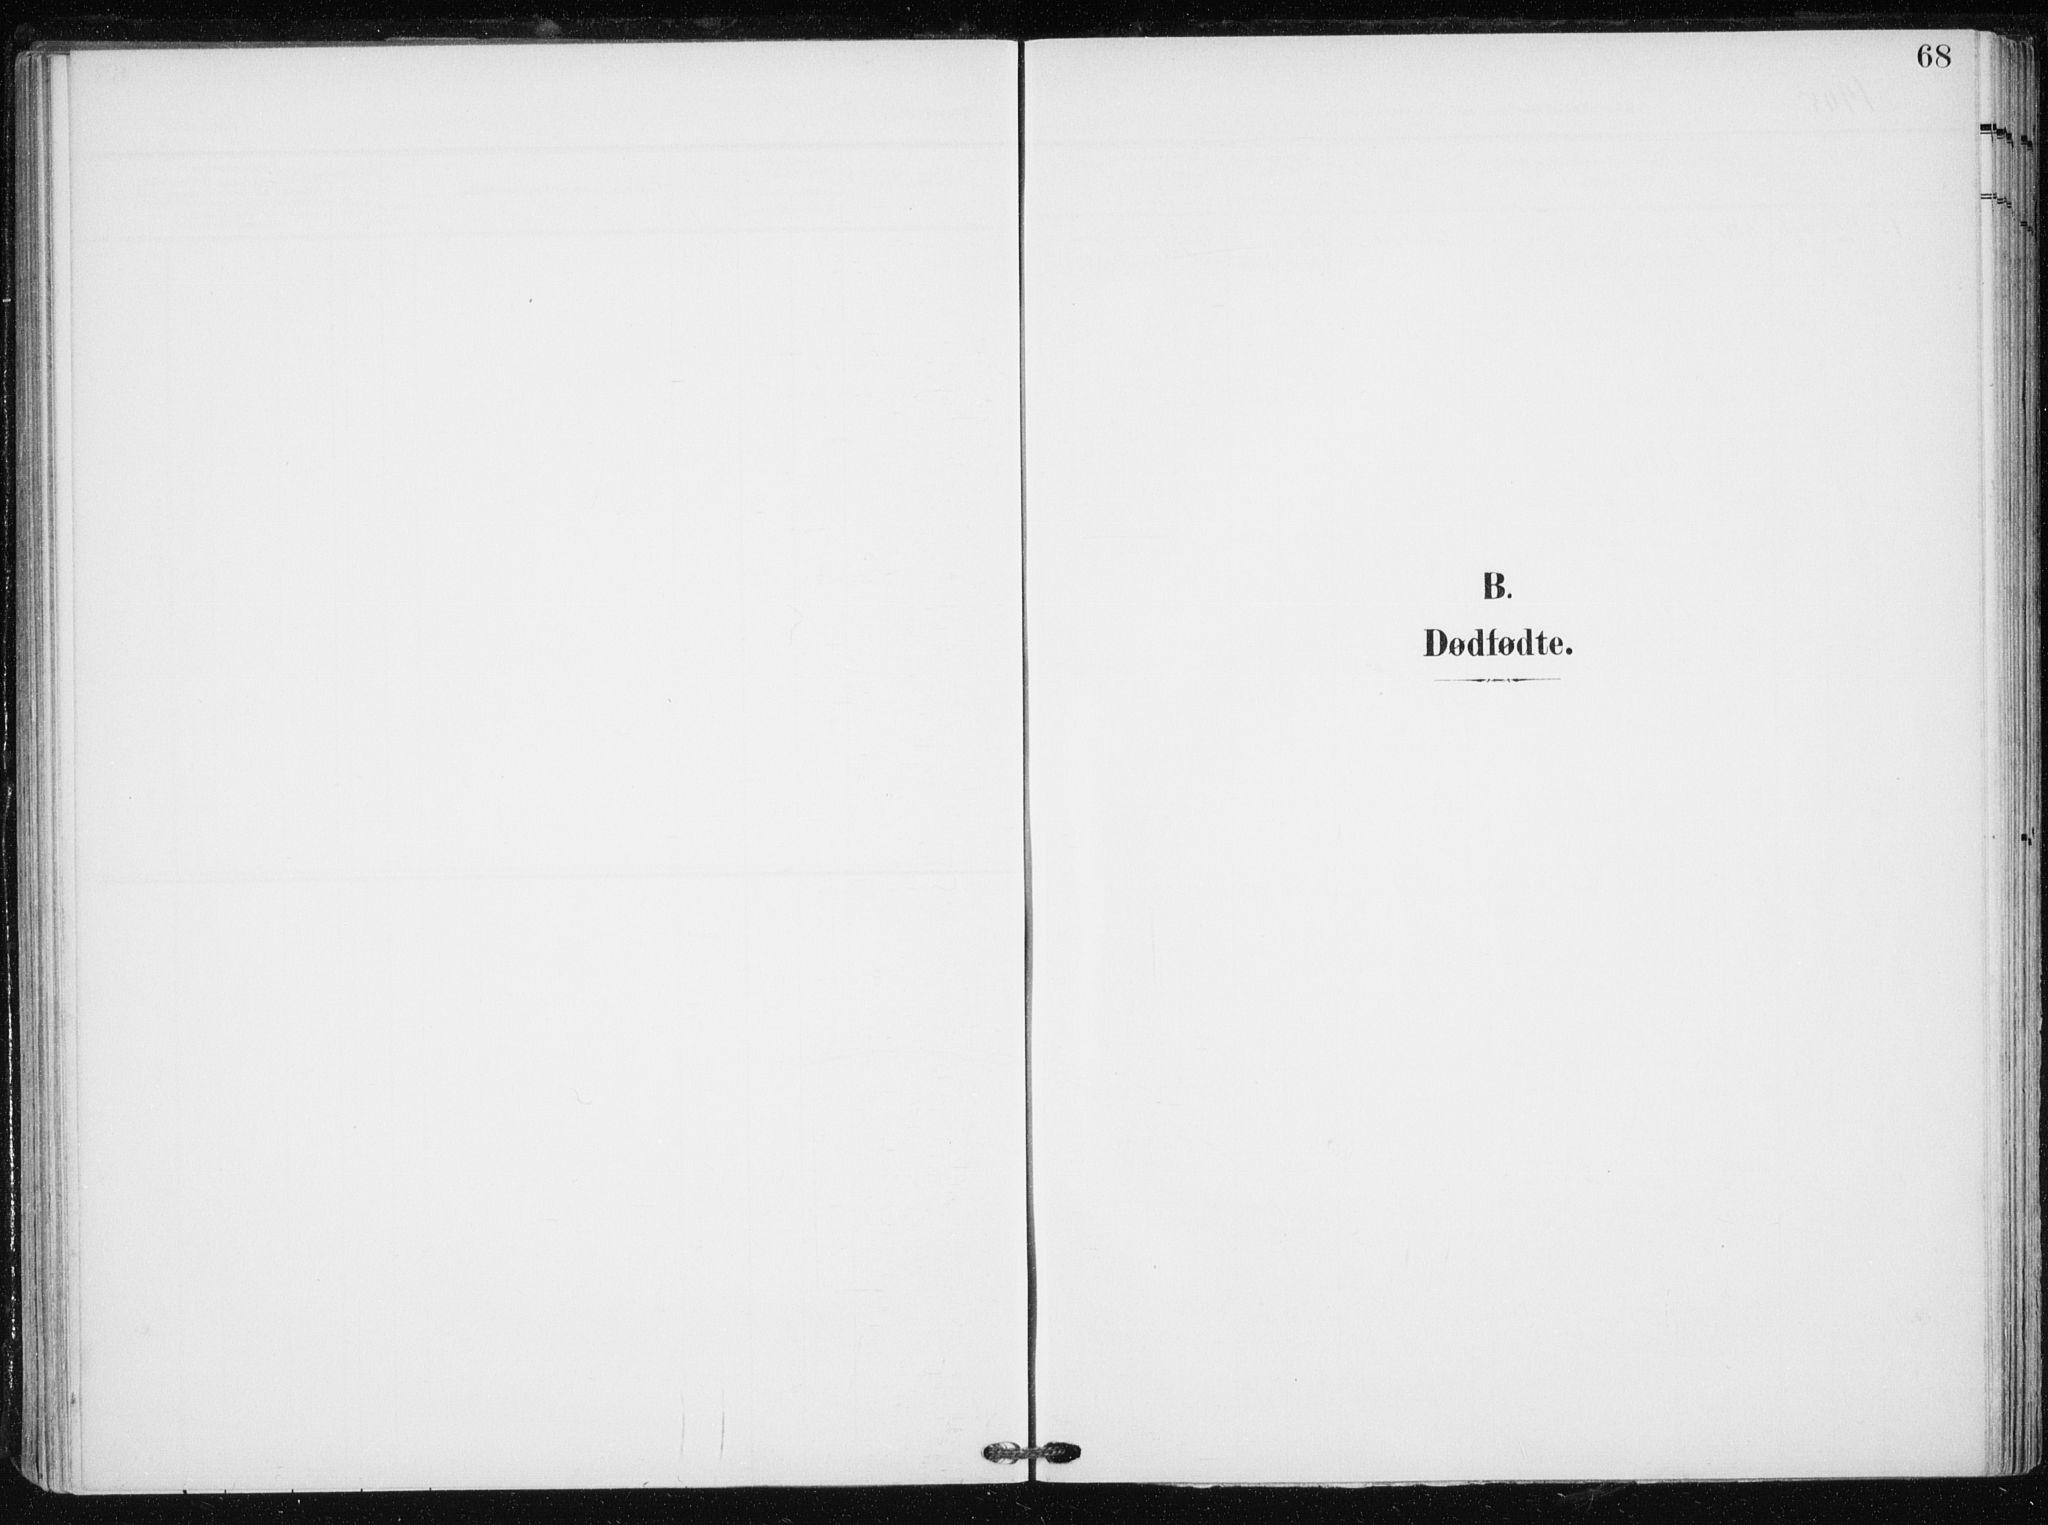 SATØ, Tranøy sokneprestkontor, I/Ia/Iaa/L0012kirke: Ministerialbok nr. 12, 1905-1918, s. 68